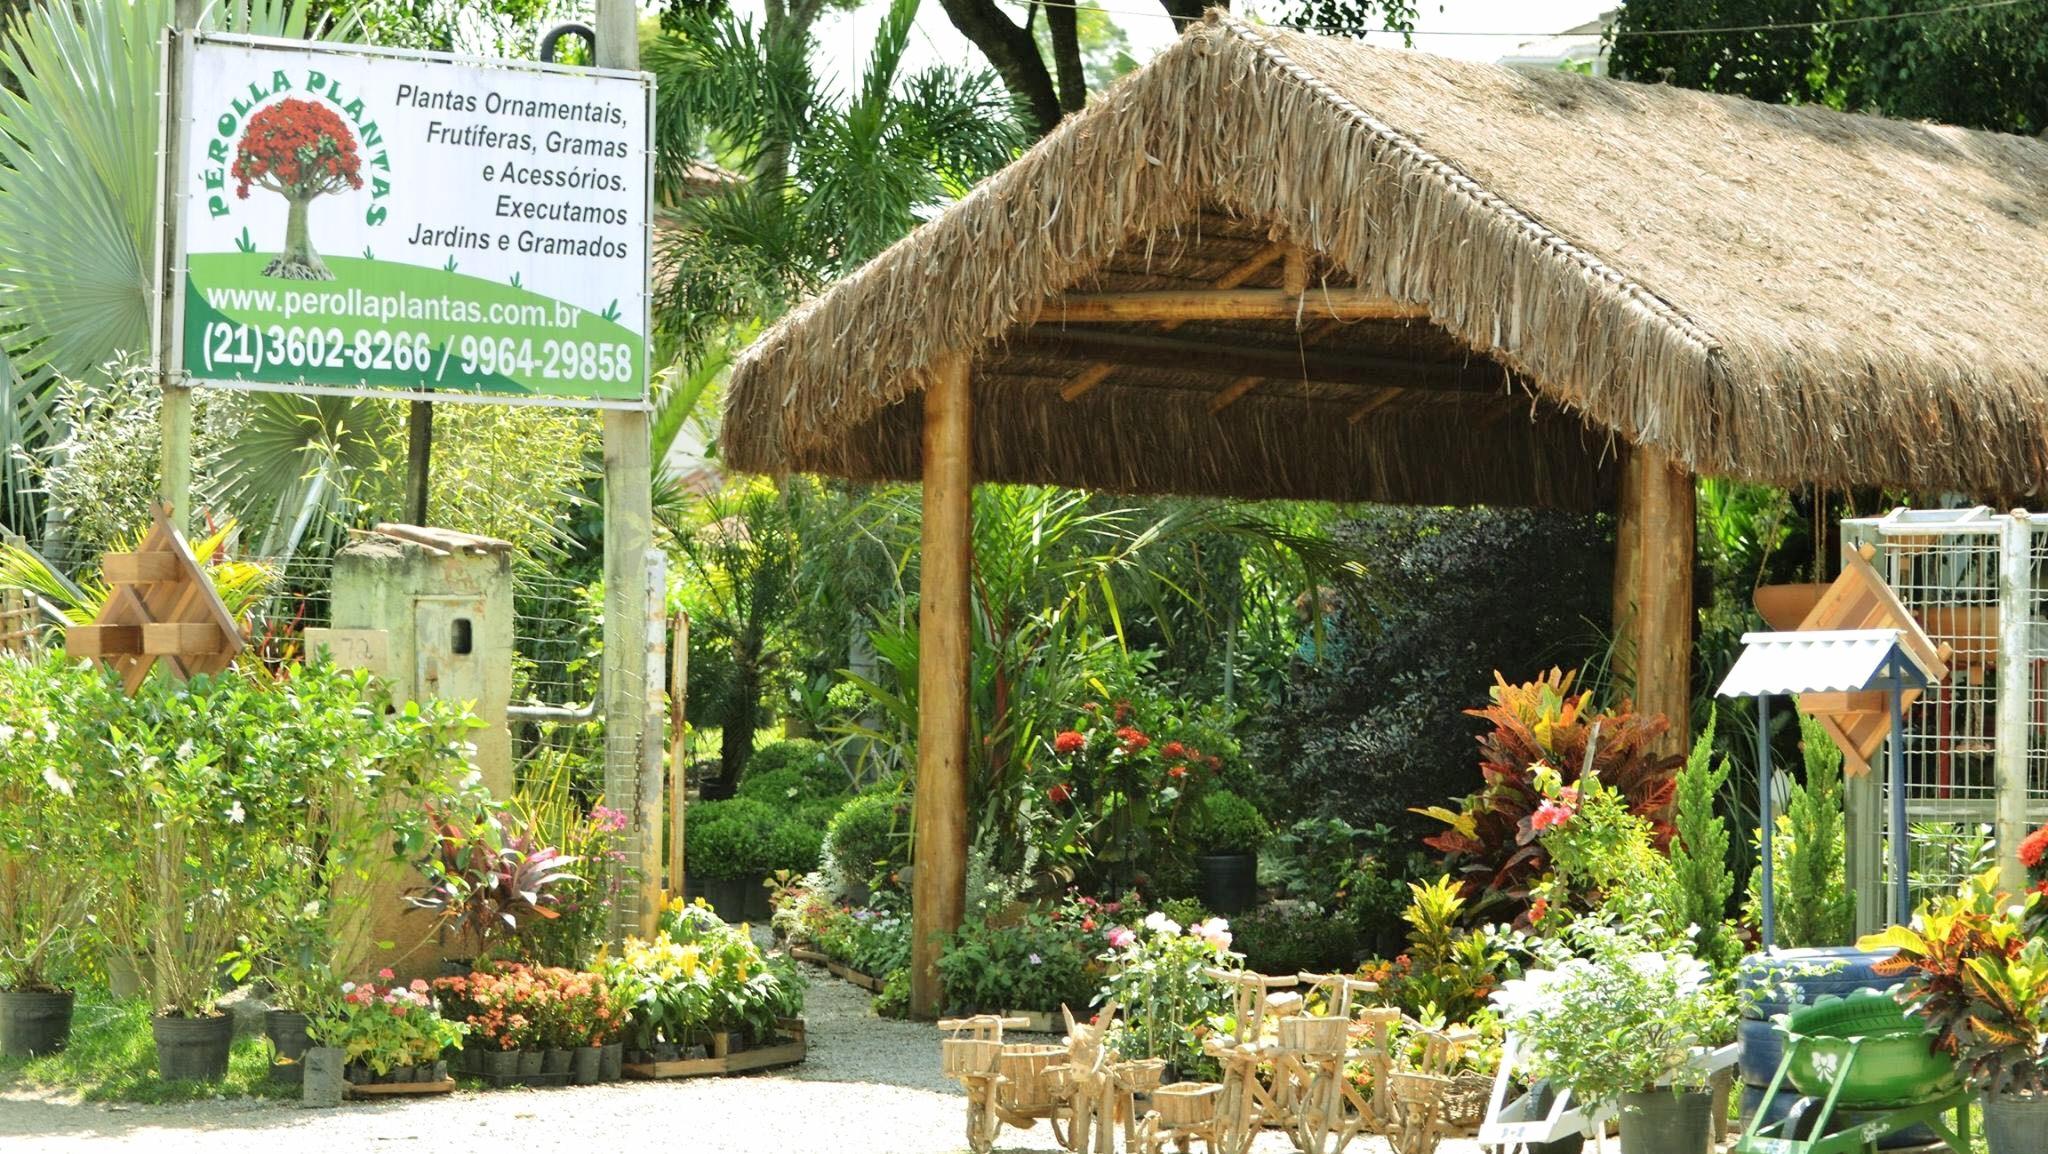 Jardinagem em itaipu Perolla Plantas